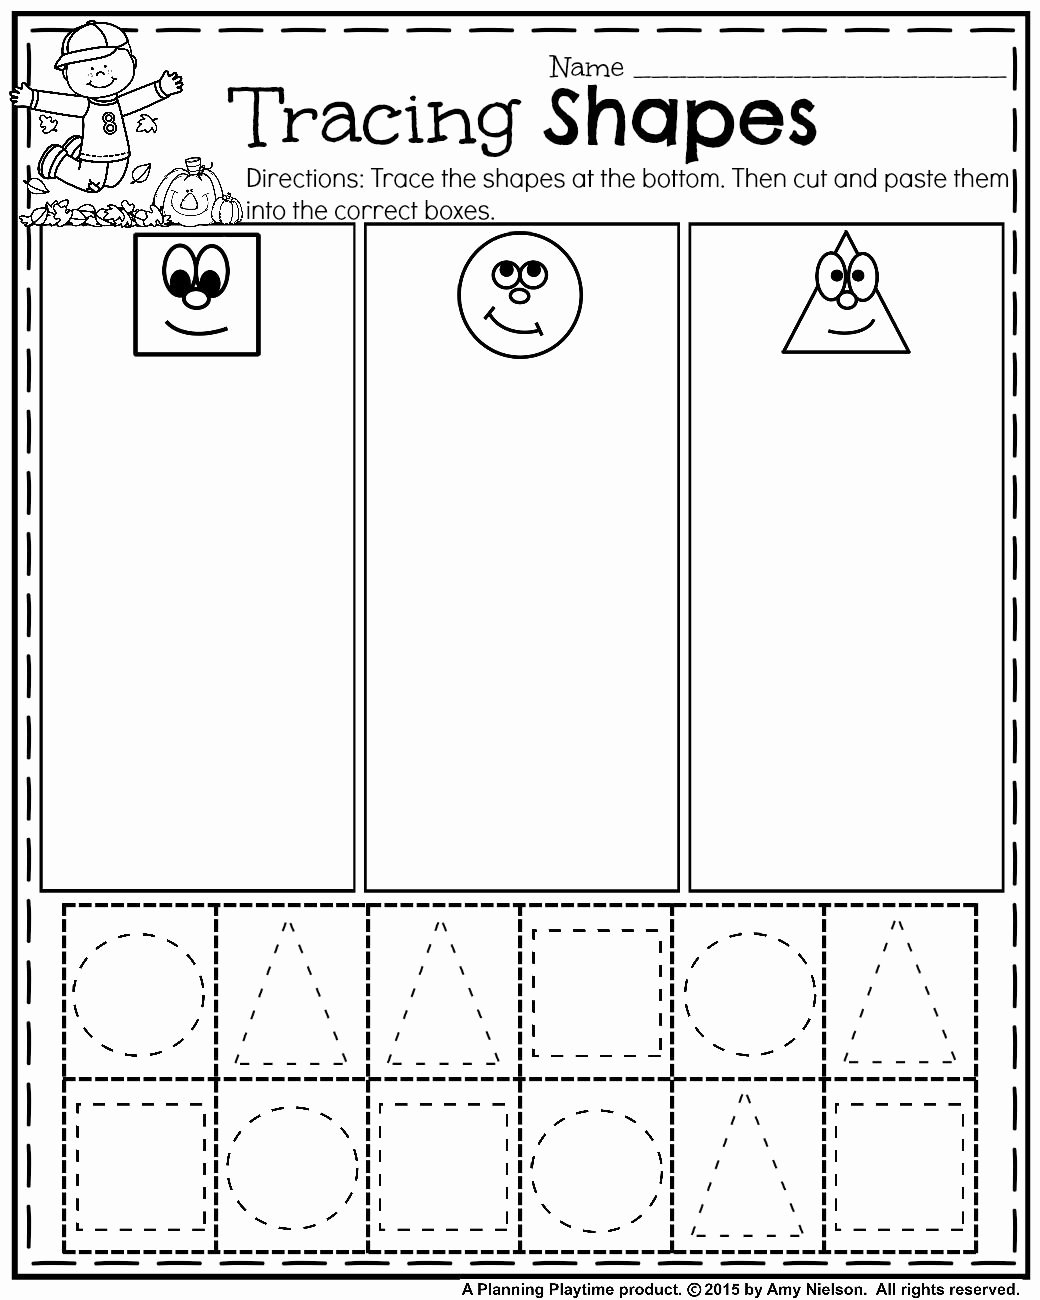 Rainbow Worksheets for Preschoolers Inspirational October Preschool Worksheets Am Rainbow